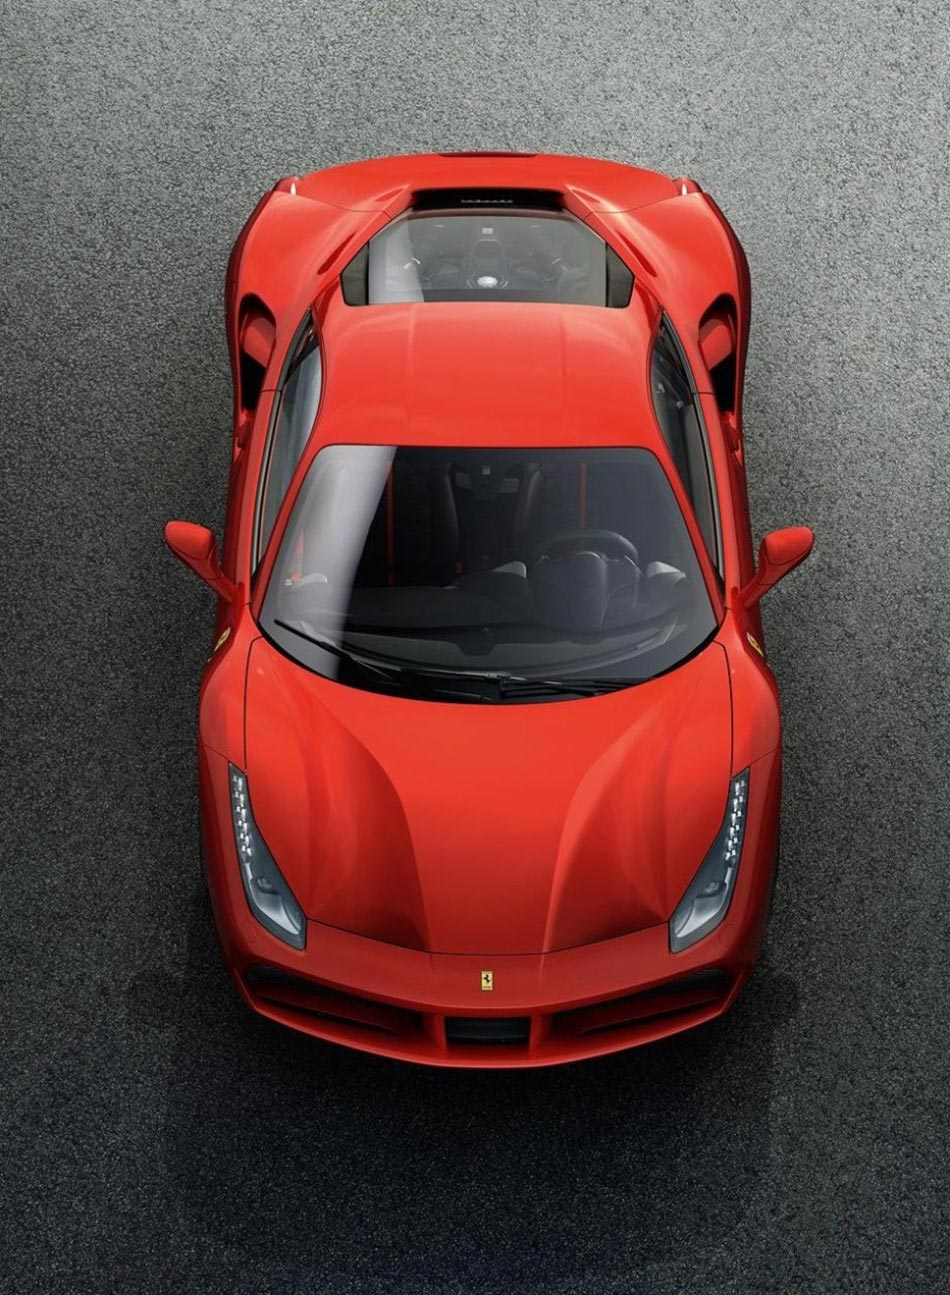 Endlich: Ferrari stellt den 488 GTB Turbo V8 mit 670PS vor 4